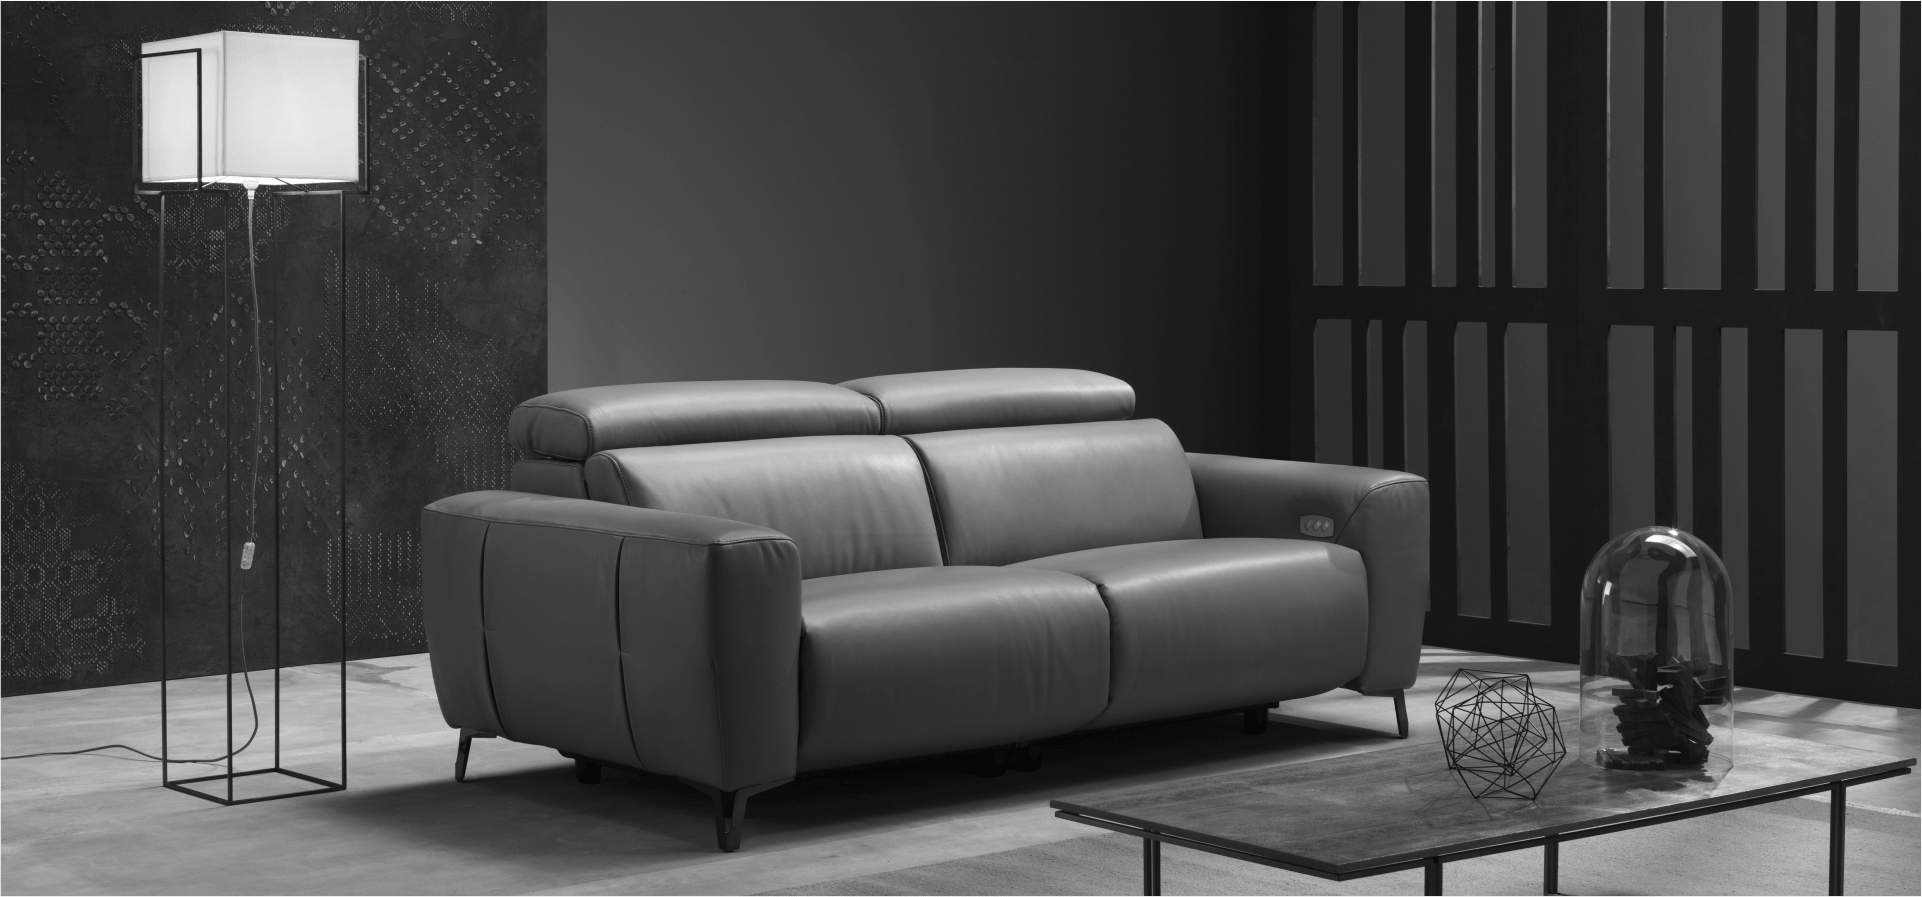 italian furniture in hyderabad Contemporary sofa set